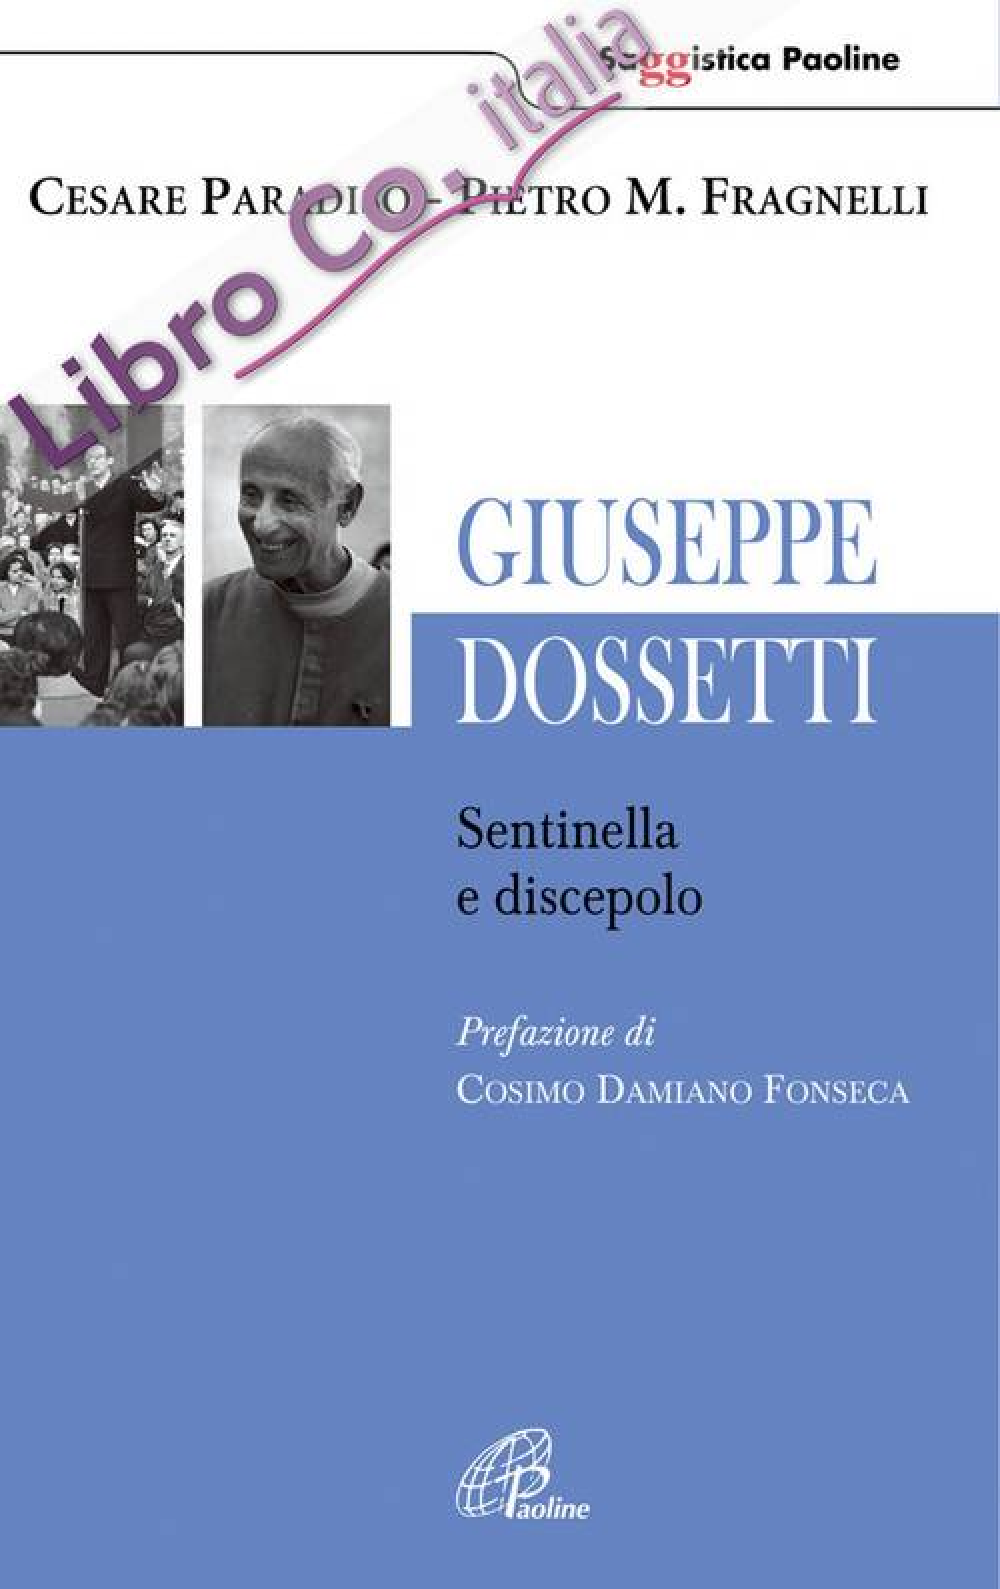 Giuseppe Dossetti. Sentinella e discepolo.